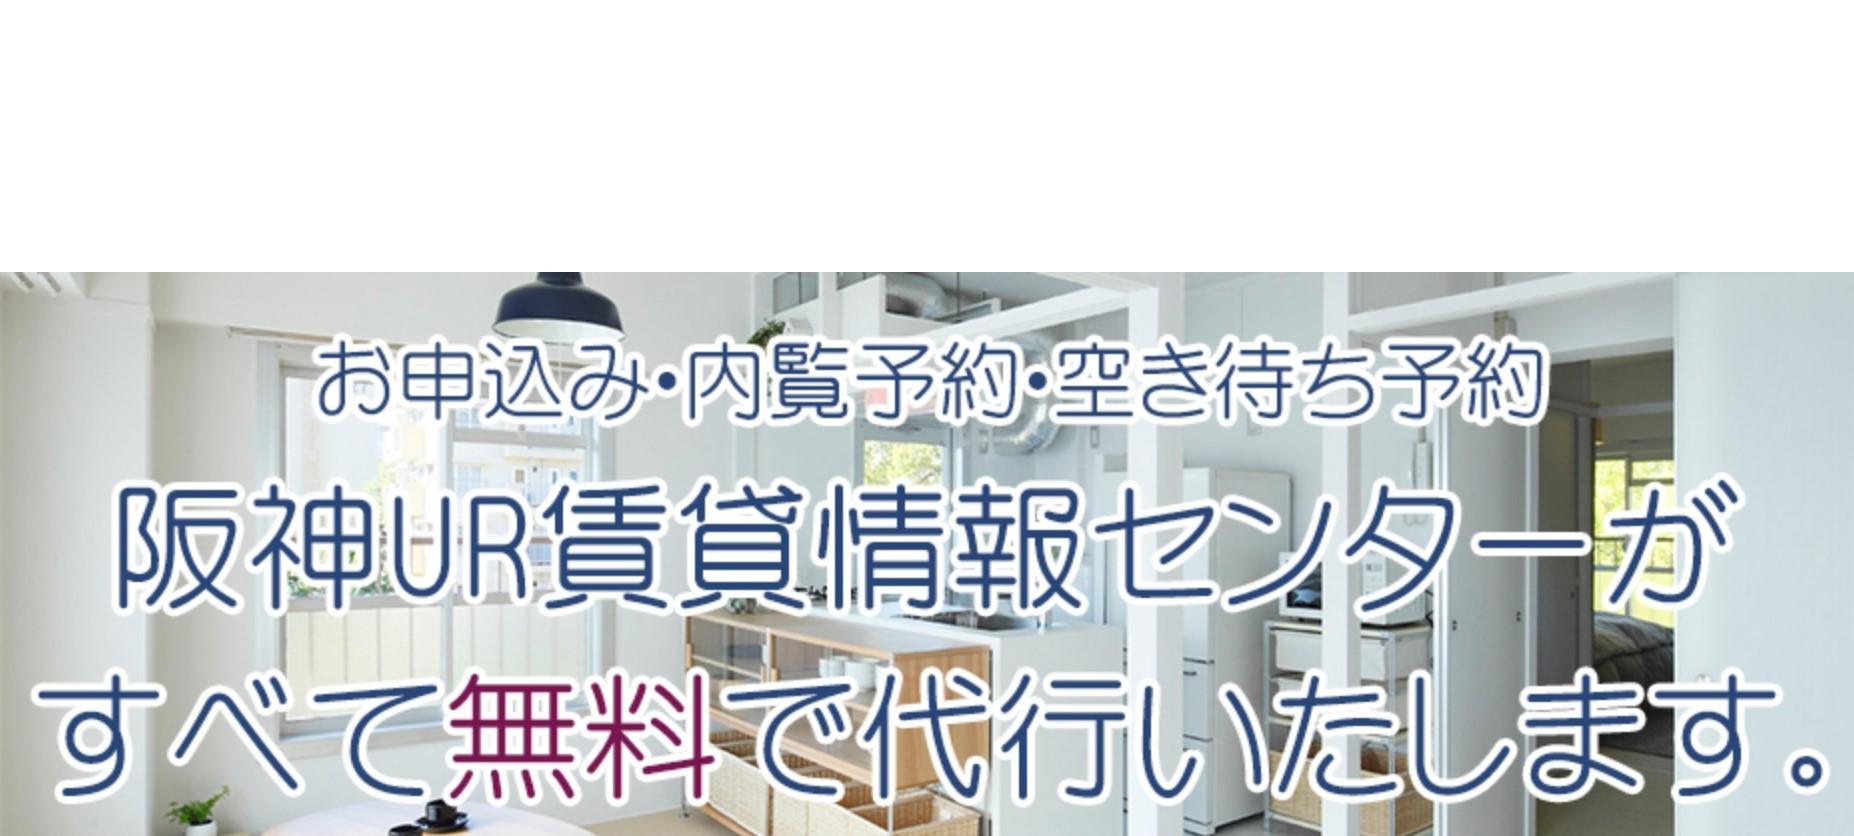 UR賃貸専用専用サイトを開設!